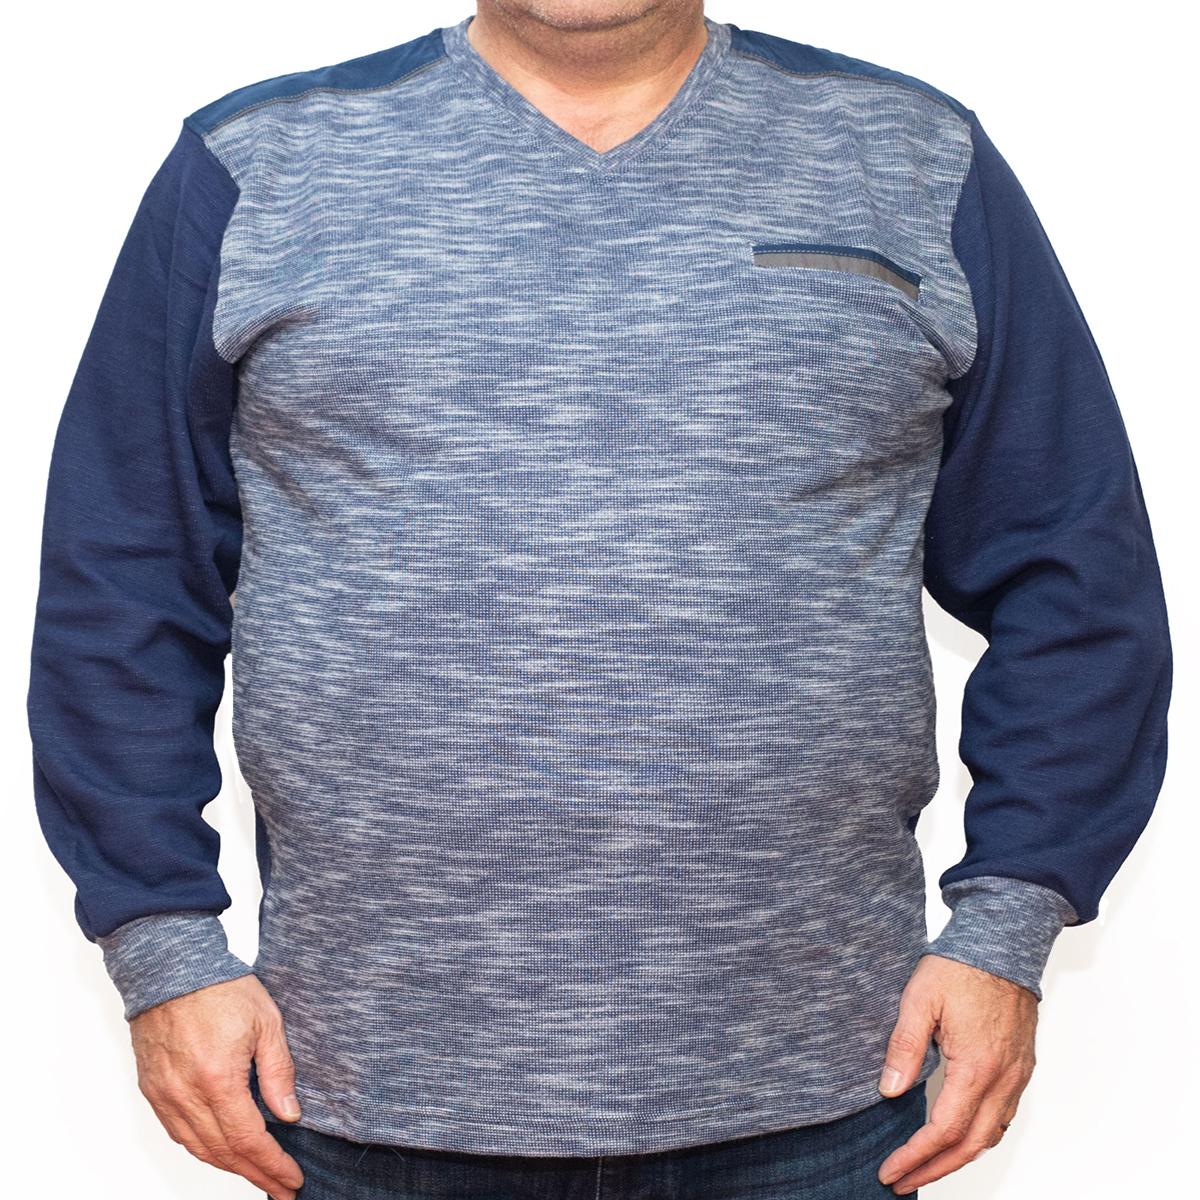 Bluza groasa albastra cu imprimeu si  anchior , Marime 3XL - egato.ro